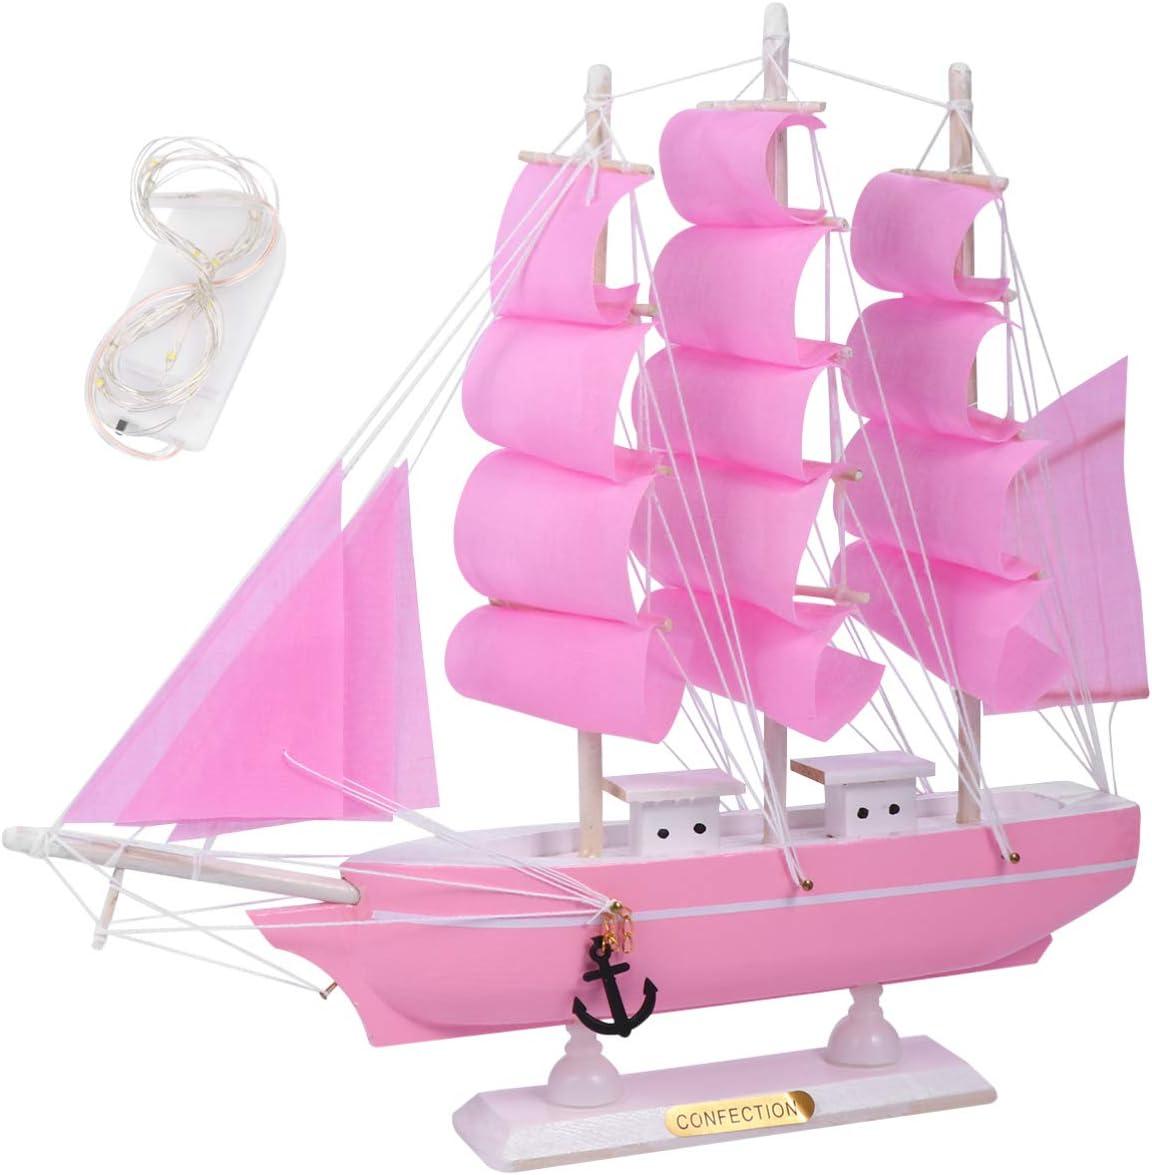 BESPORTBLE Sailing Ship Model Decor Wooden Miniature Sailing Boat Sailboat Model with LED Light Handmade Vintage Nautical Sail Ship Marine Coastal Tabletop Ornament for Home Decor